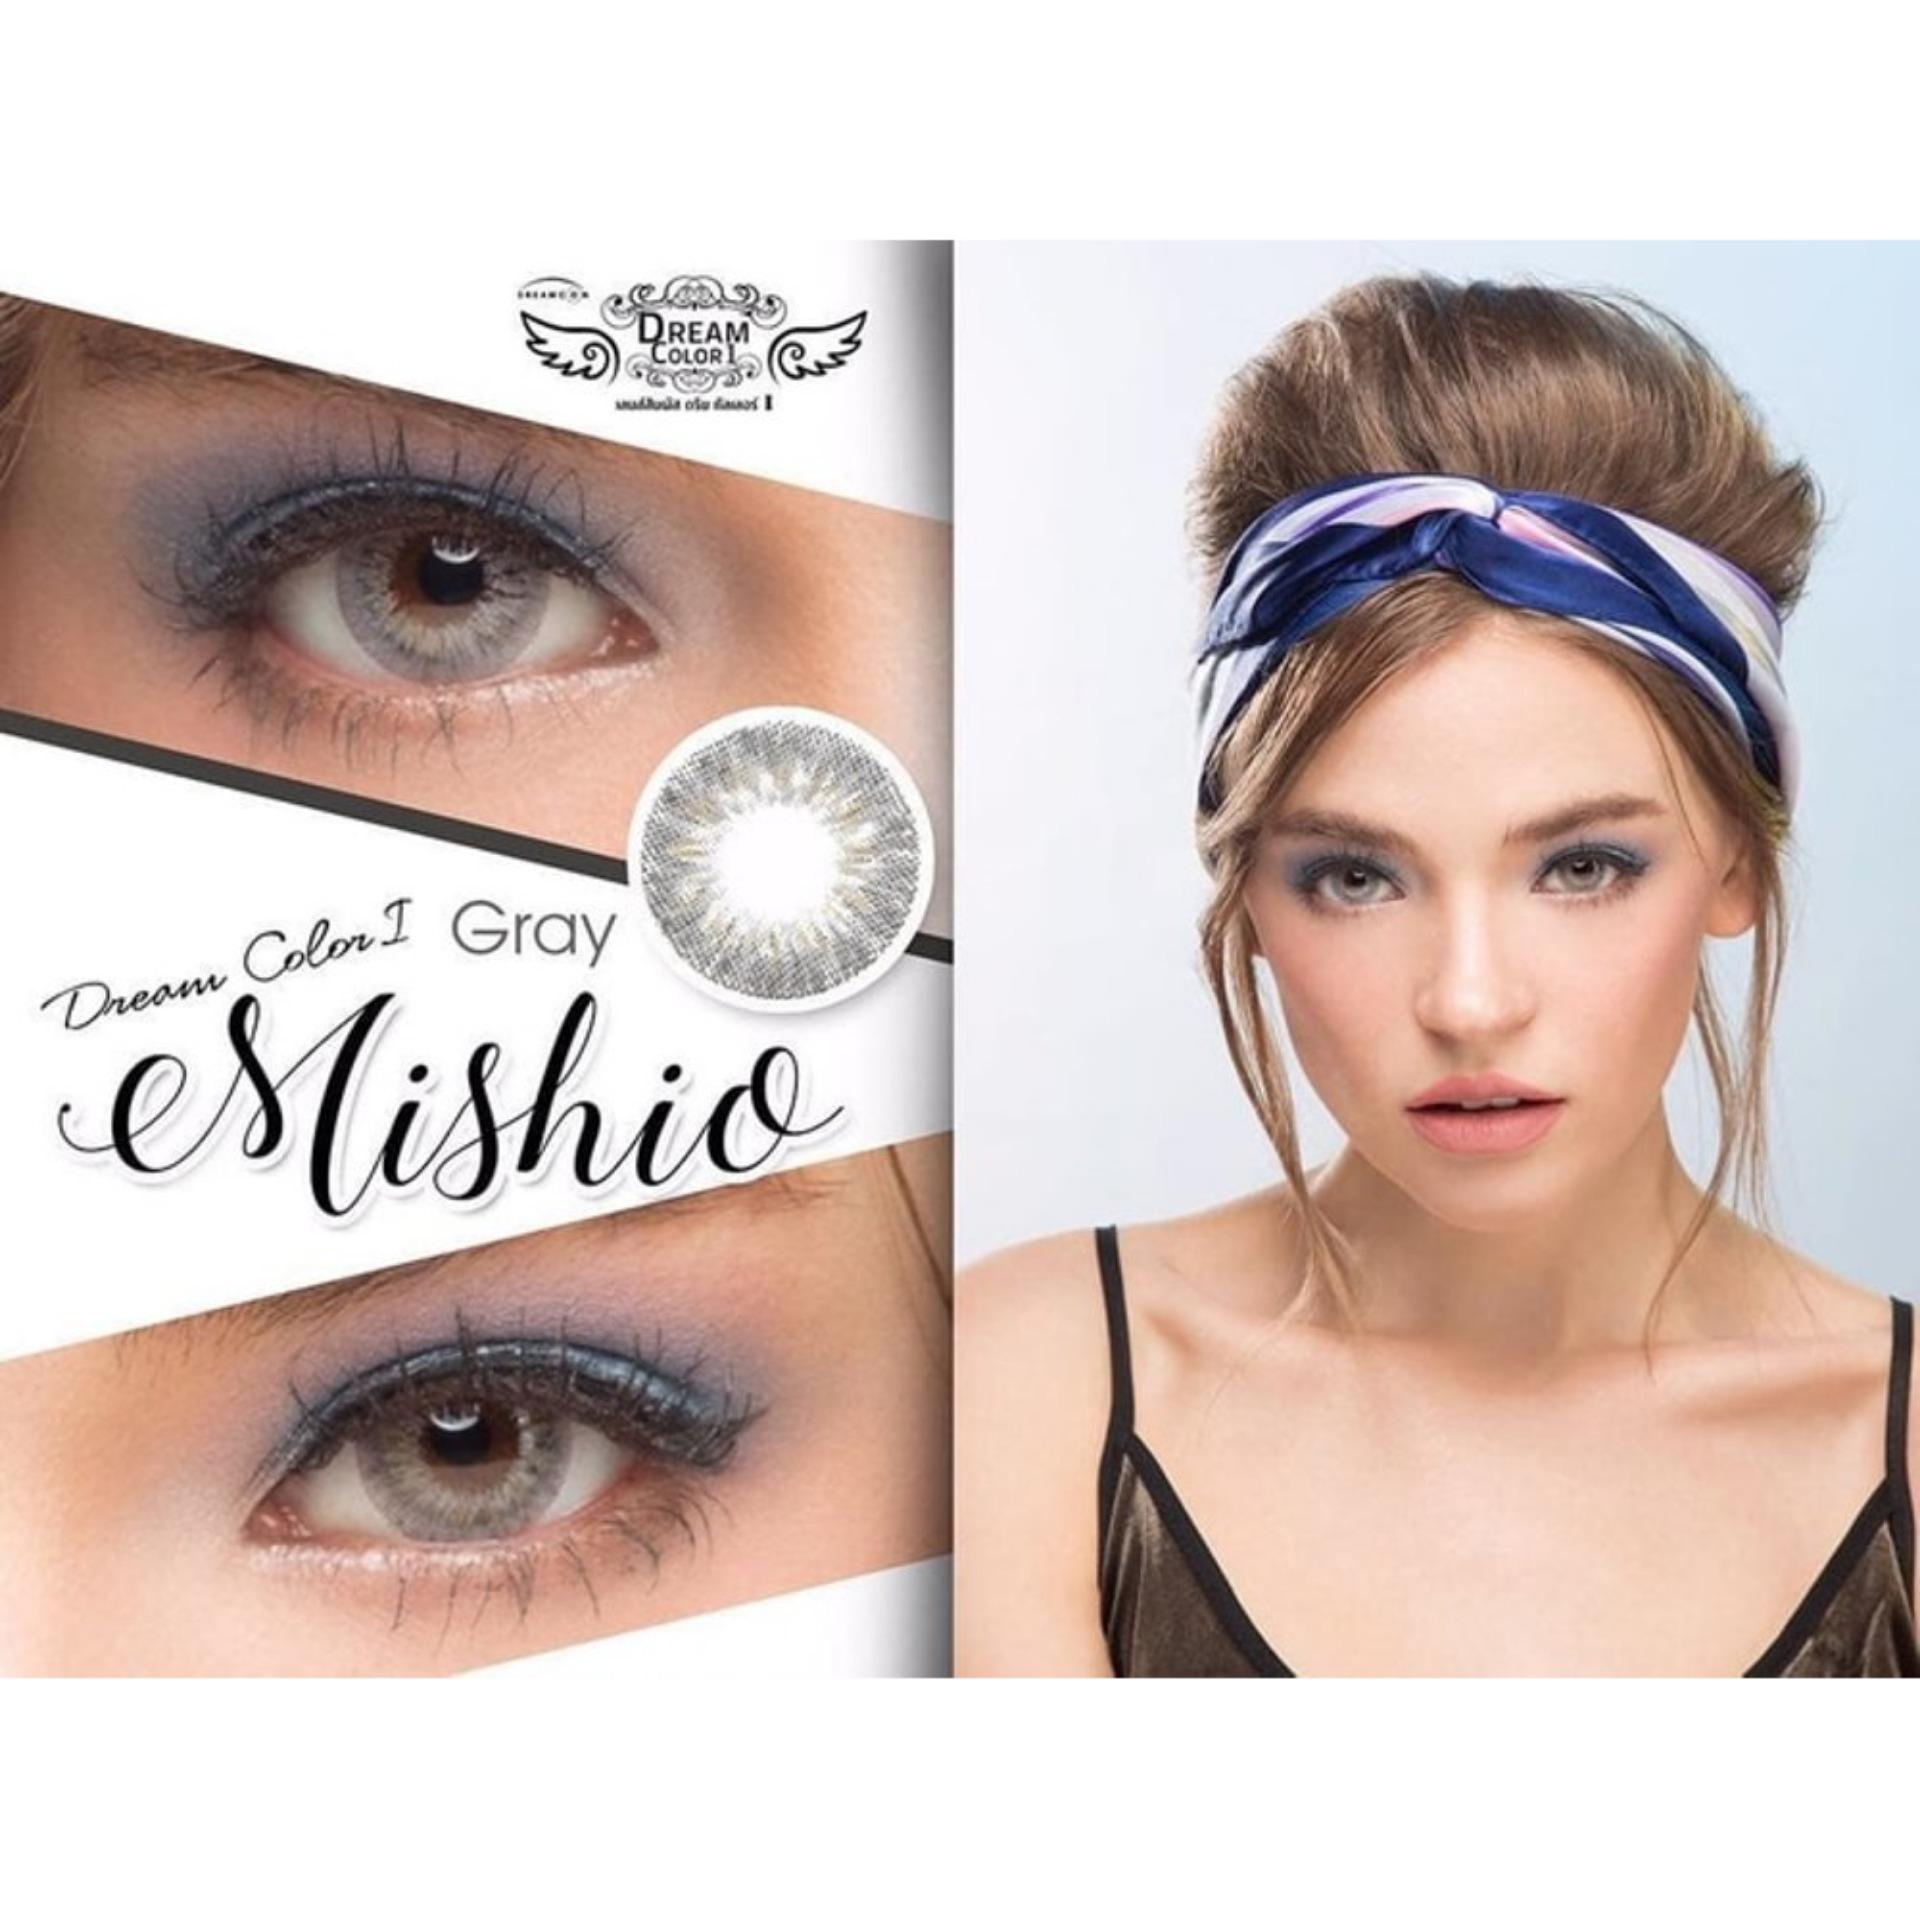 Mishio Softlens Dream Color + Free Lenscase - Gray